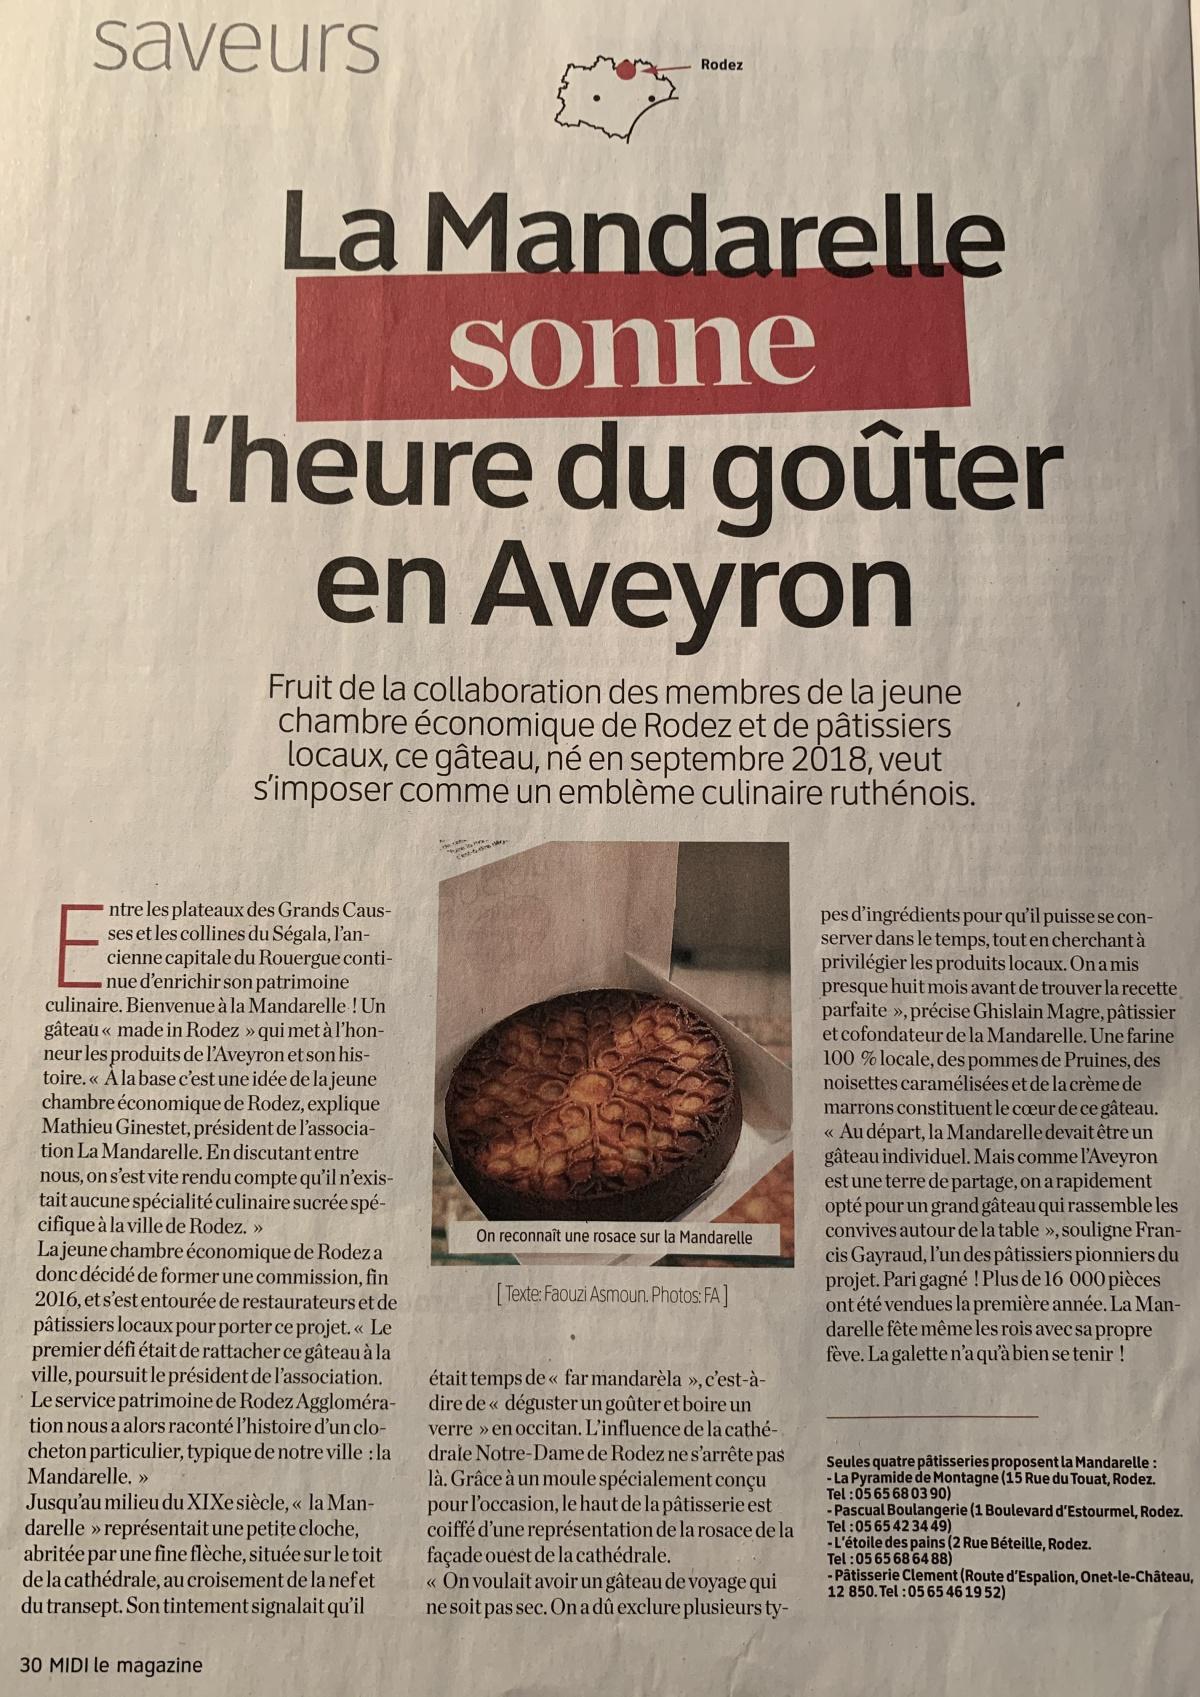 La mandarelle sonne l'heure du goûter en Aveyron